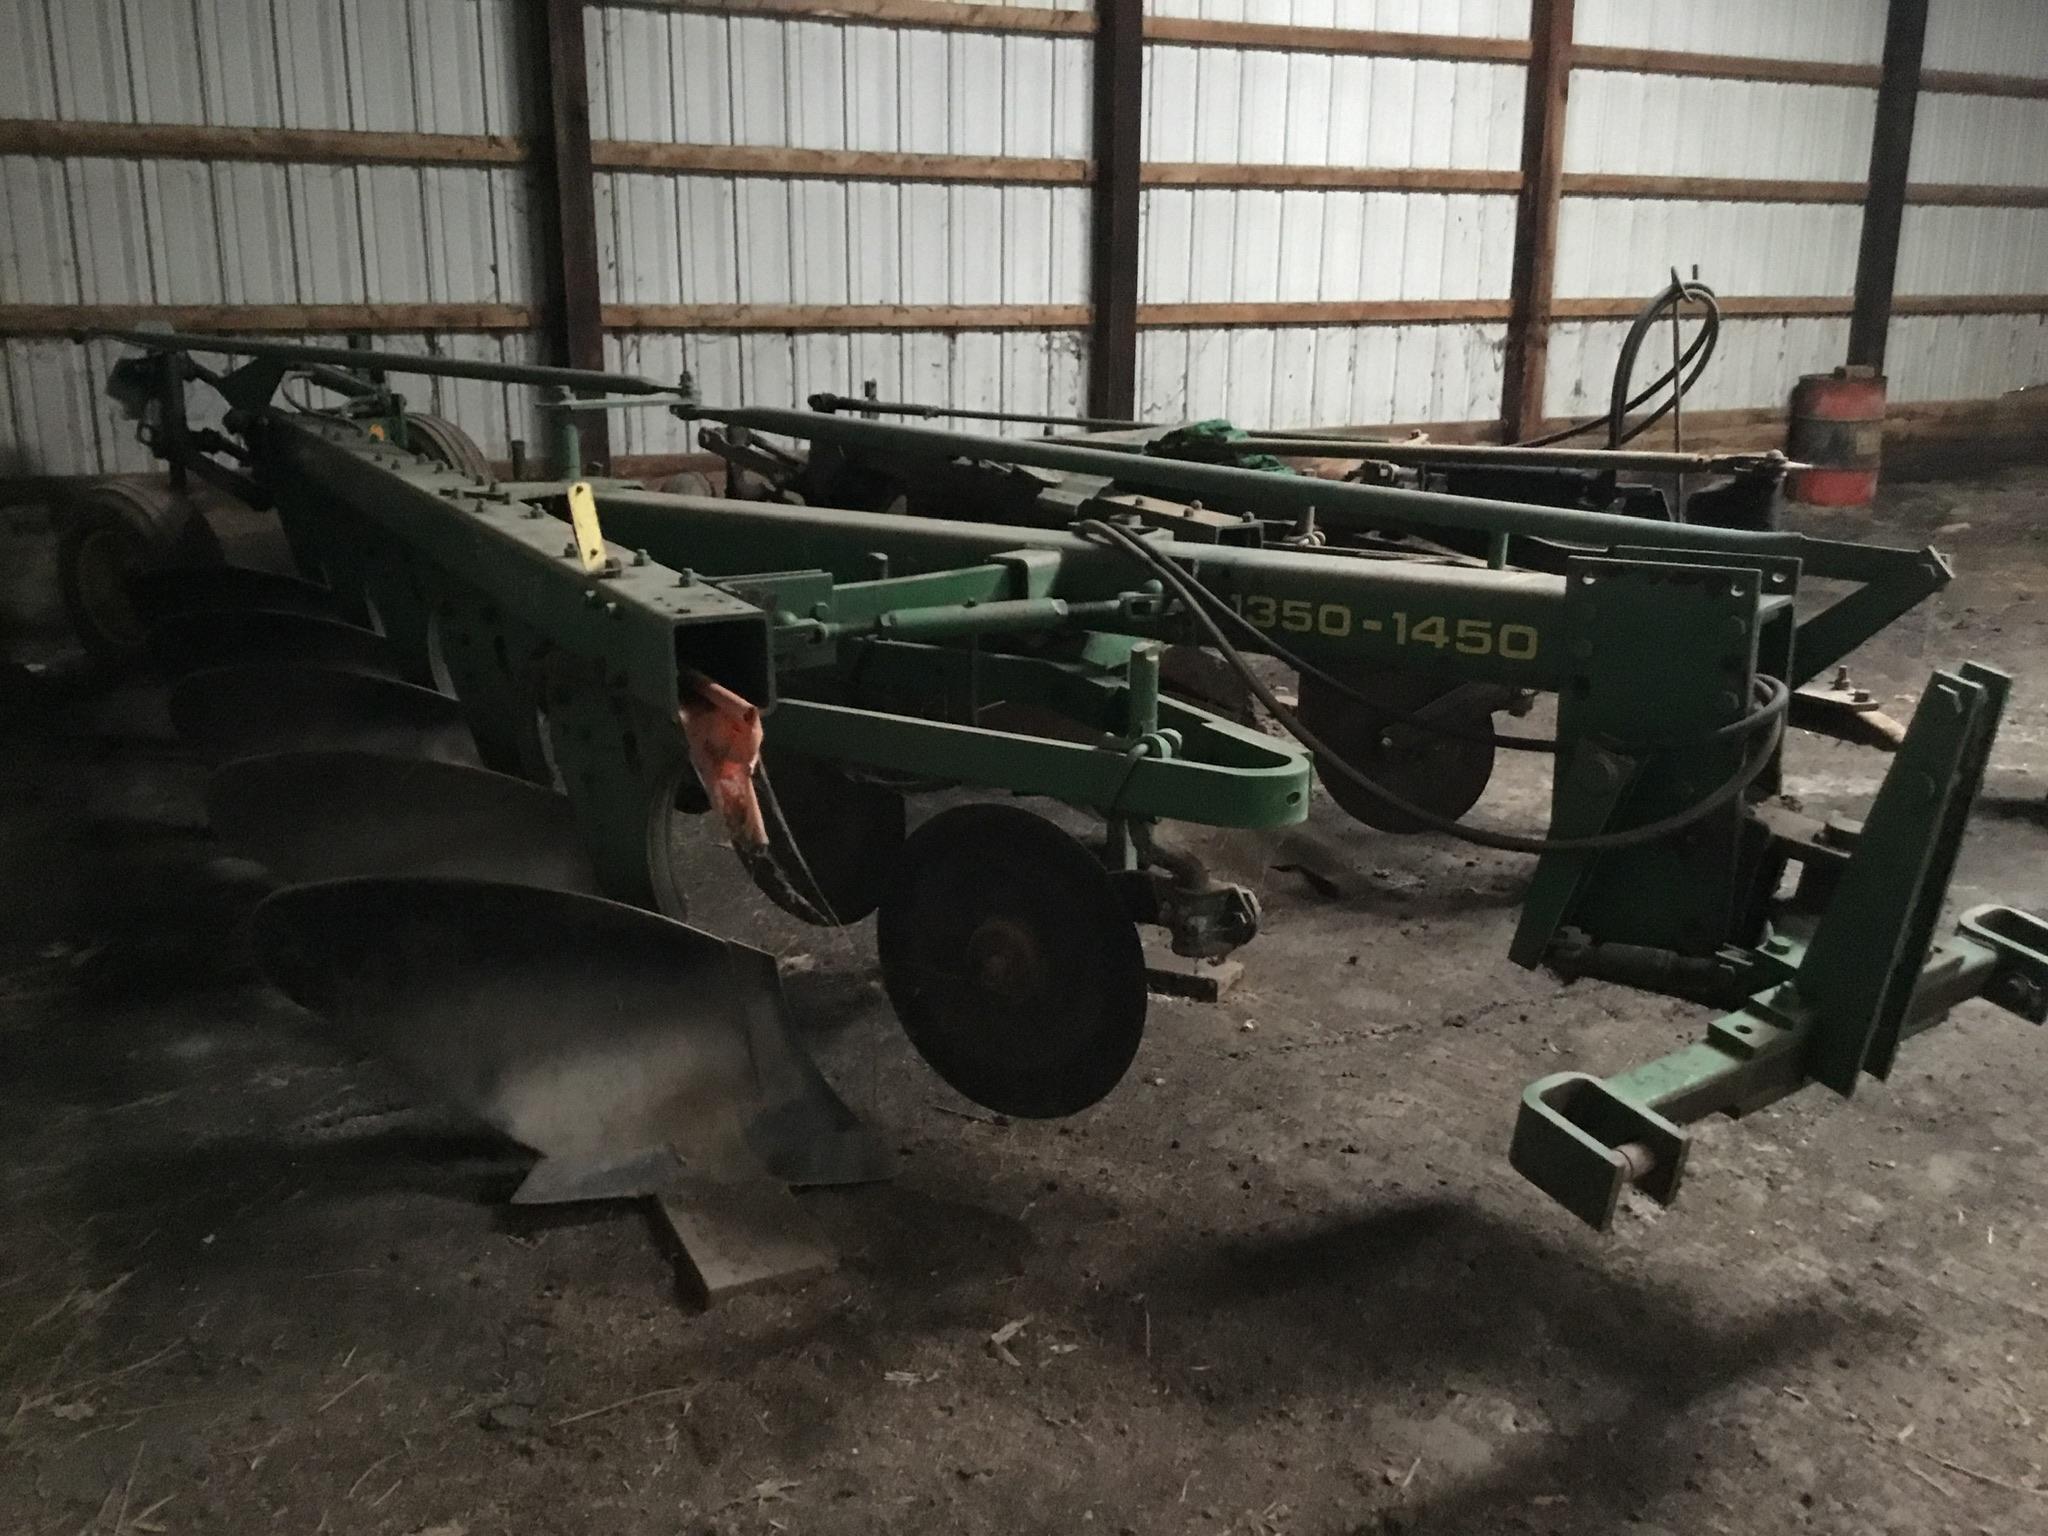 John Deere 1350-1450 5 Bottom Plow, 5/18 Bottoms Serial #25149